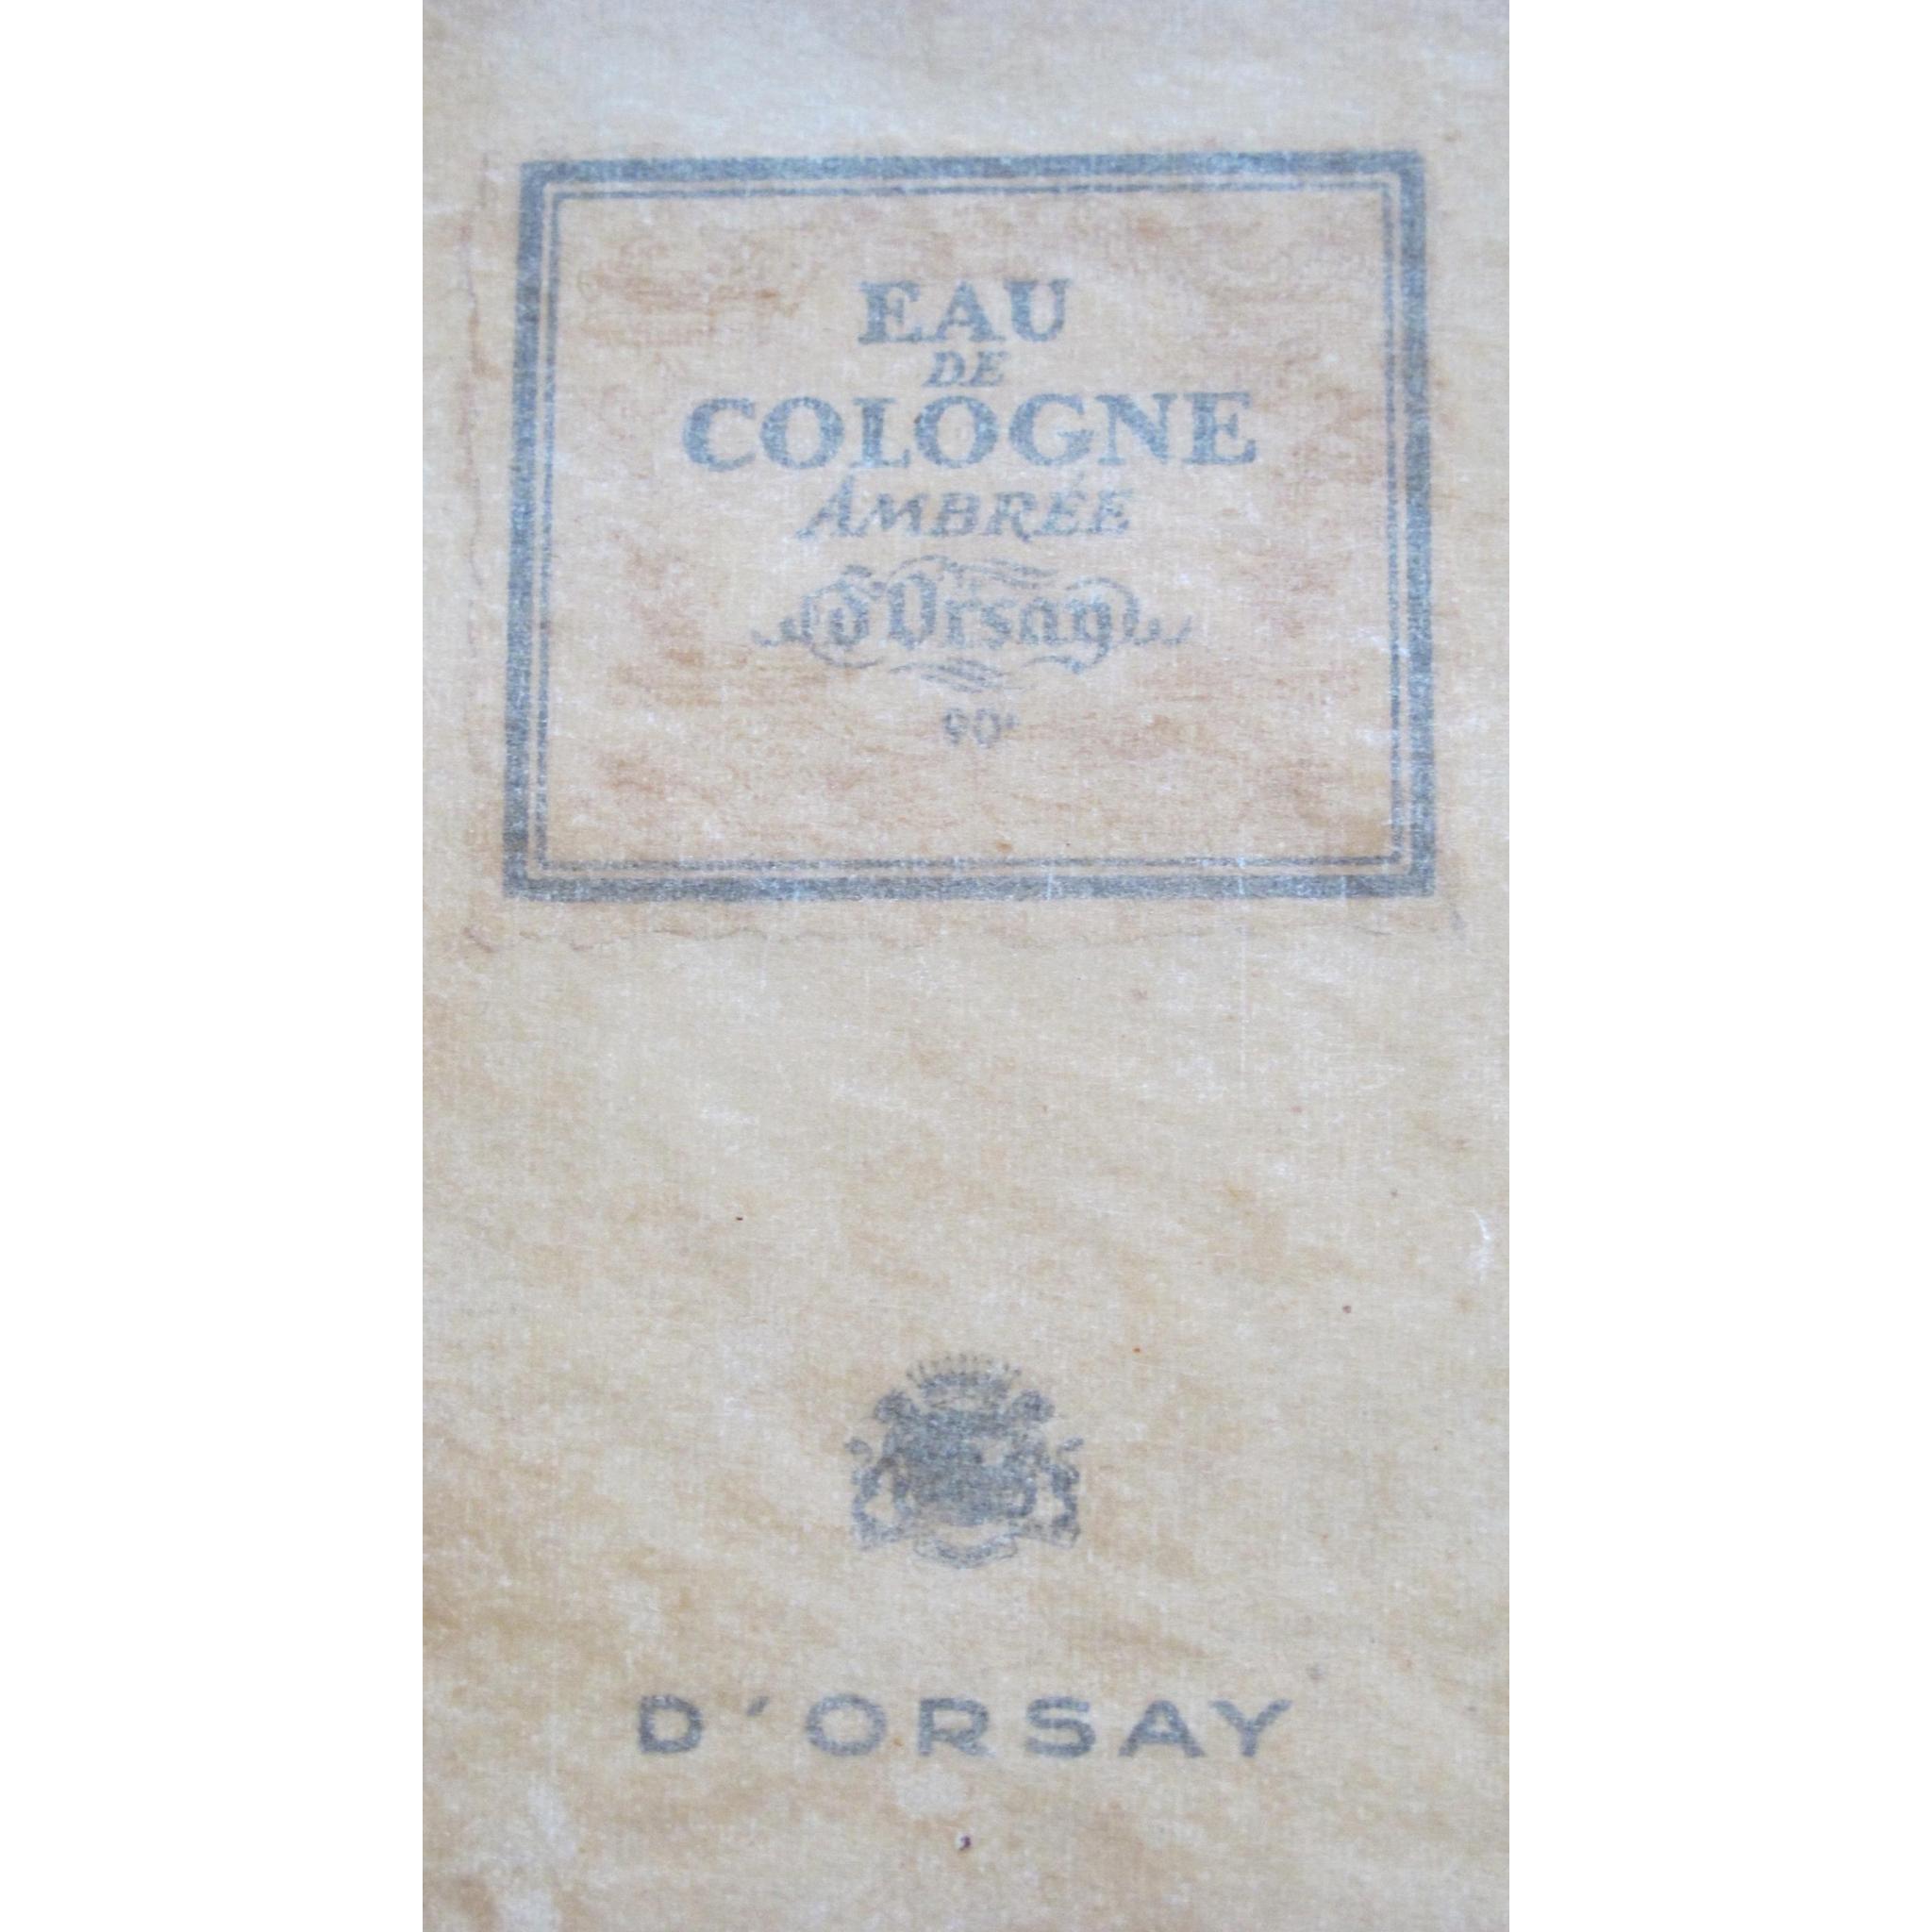 Boxed Perfume Bottle D'Orsay Ambree Eau de Cologne